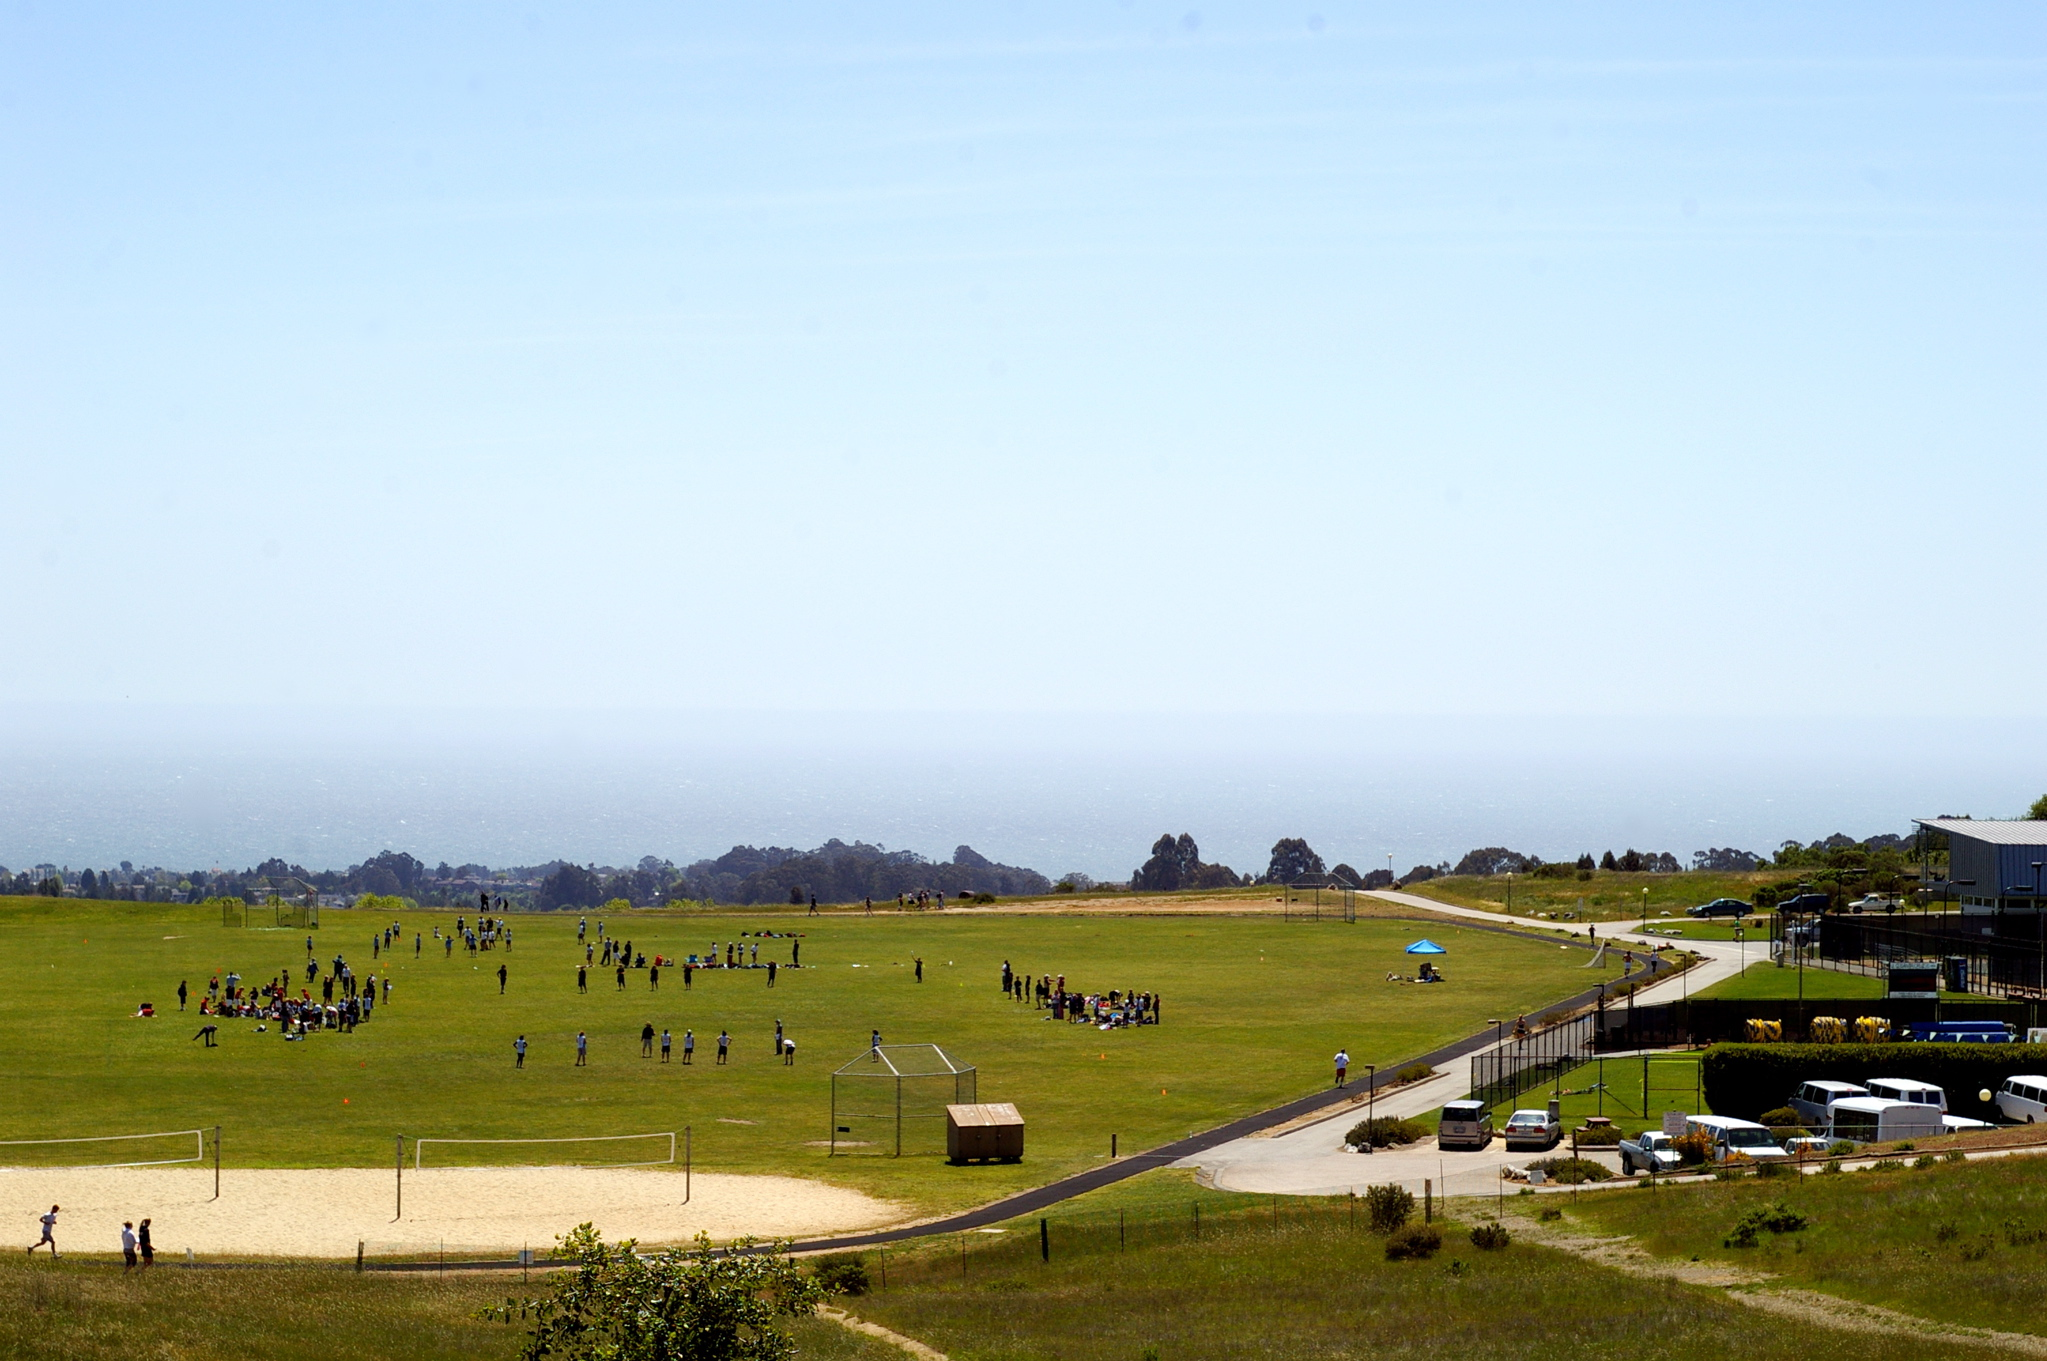 University Of California Santa Cruz Wikipedia - Google maps kresgie college us santa cruz